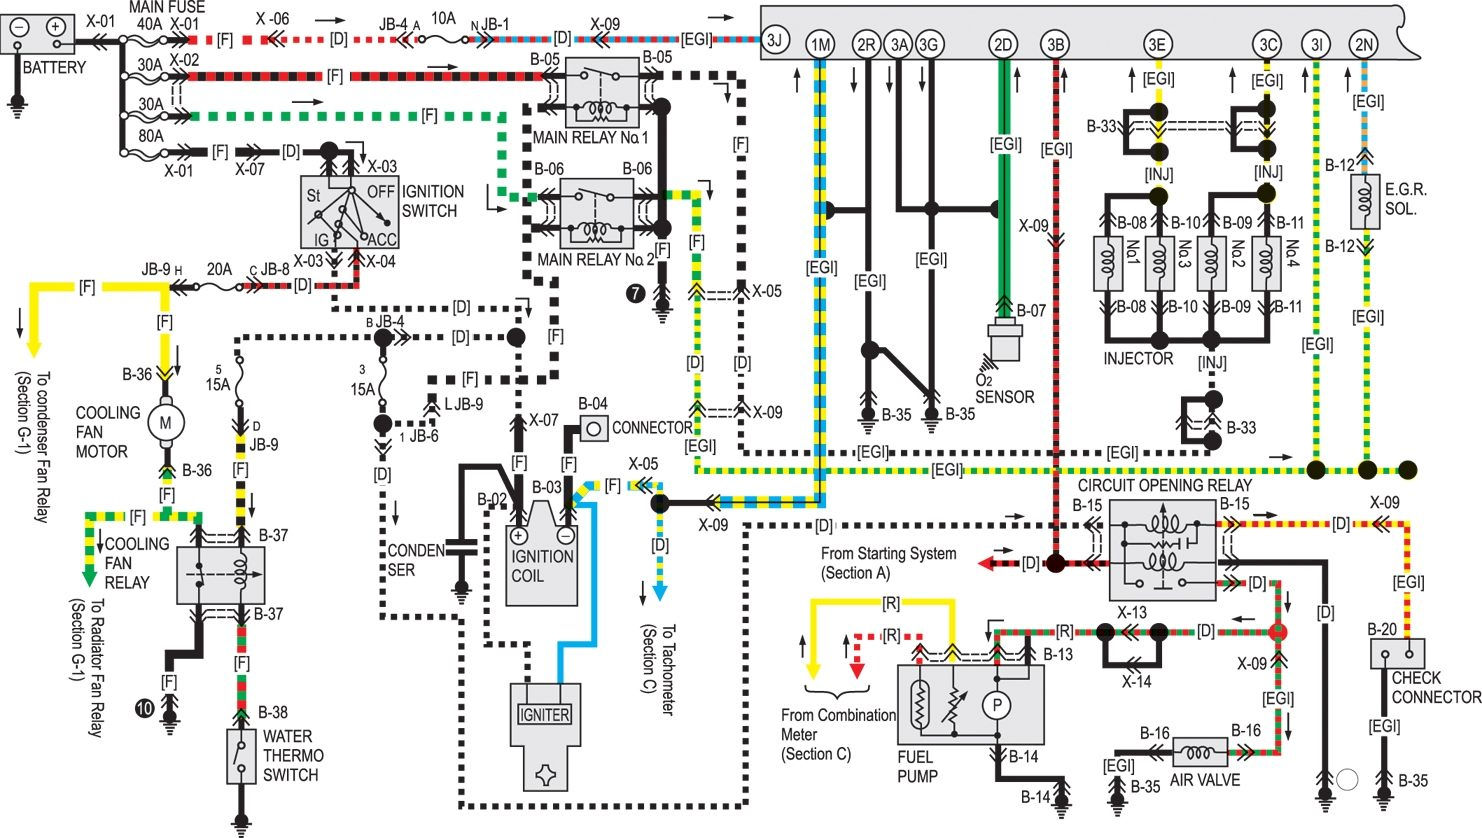 mazda b2600 wiring diagram omc wiring diagrams free 92 Mazda B2200 Headlight Wiring Diagram  1993 Mazda Miata Wiring Diagram 1996 Mazda B2300 Wiring Blower 2012 Mazda 3 Wiring Diagram